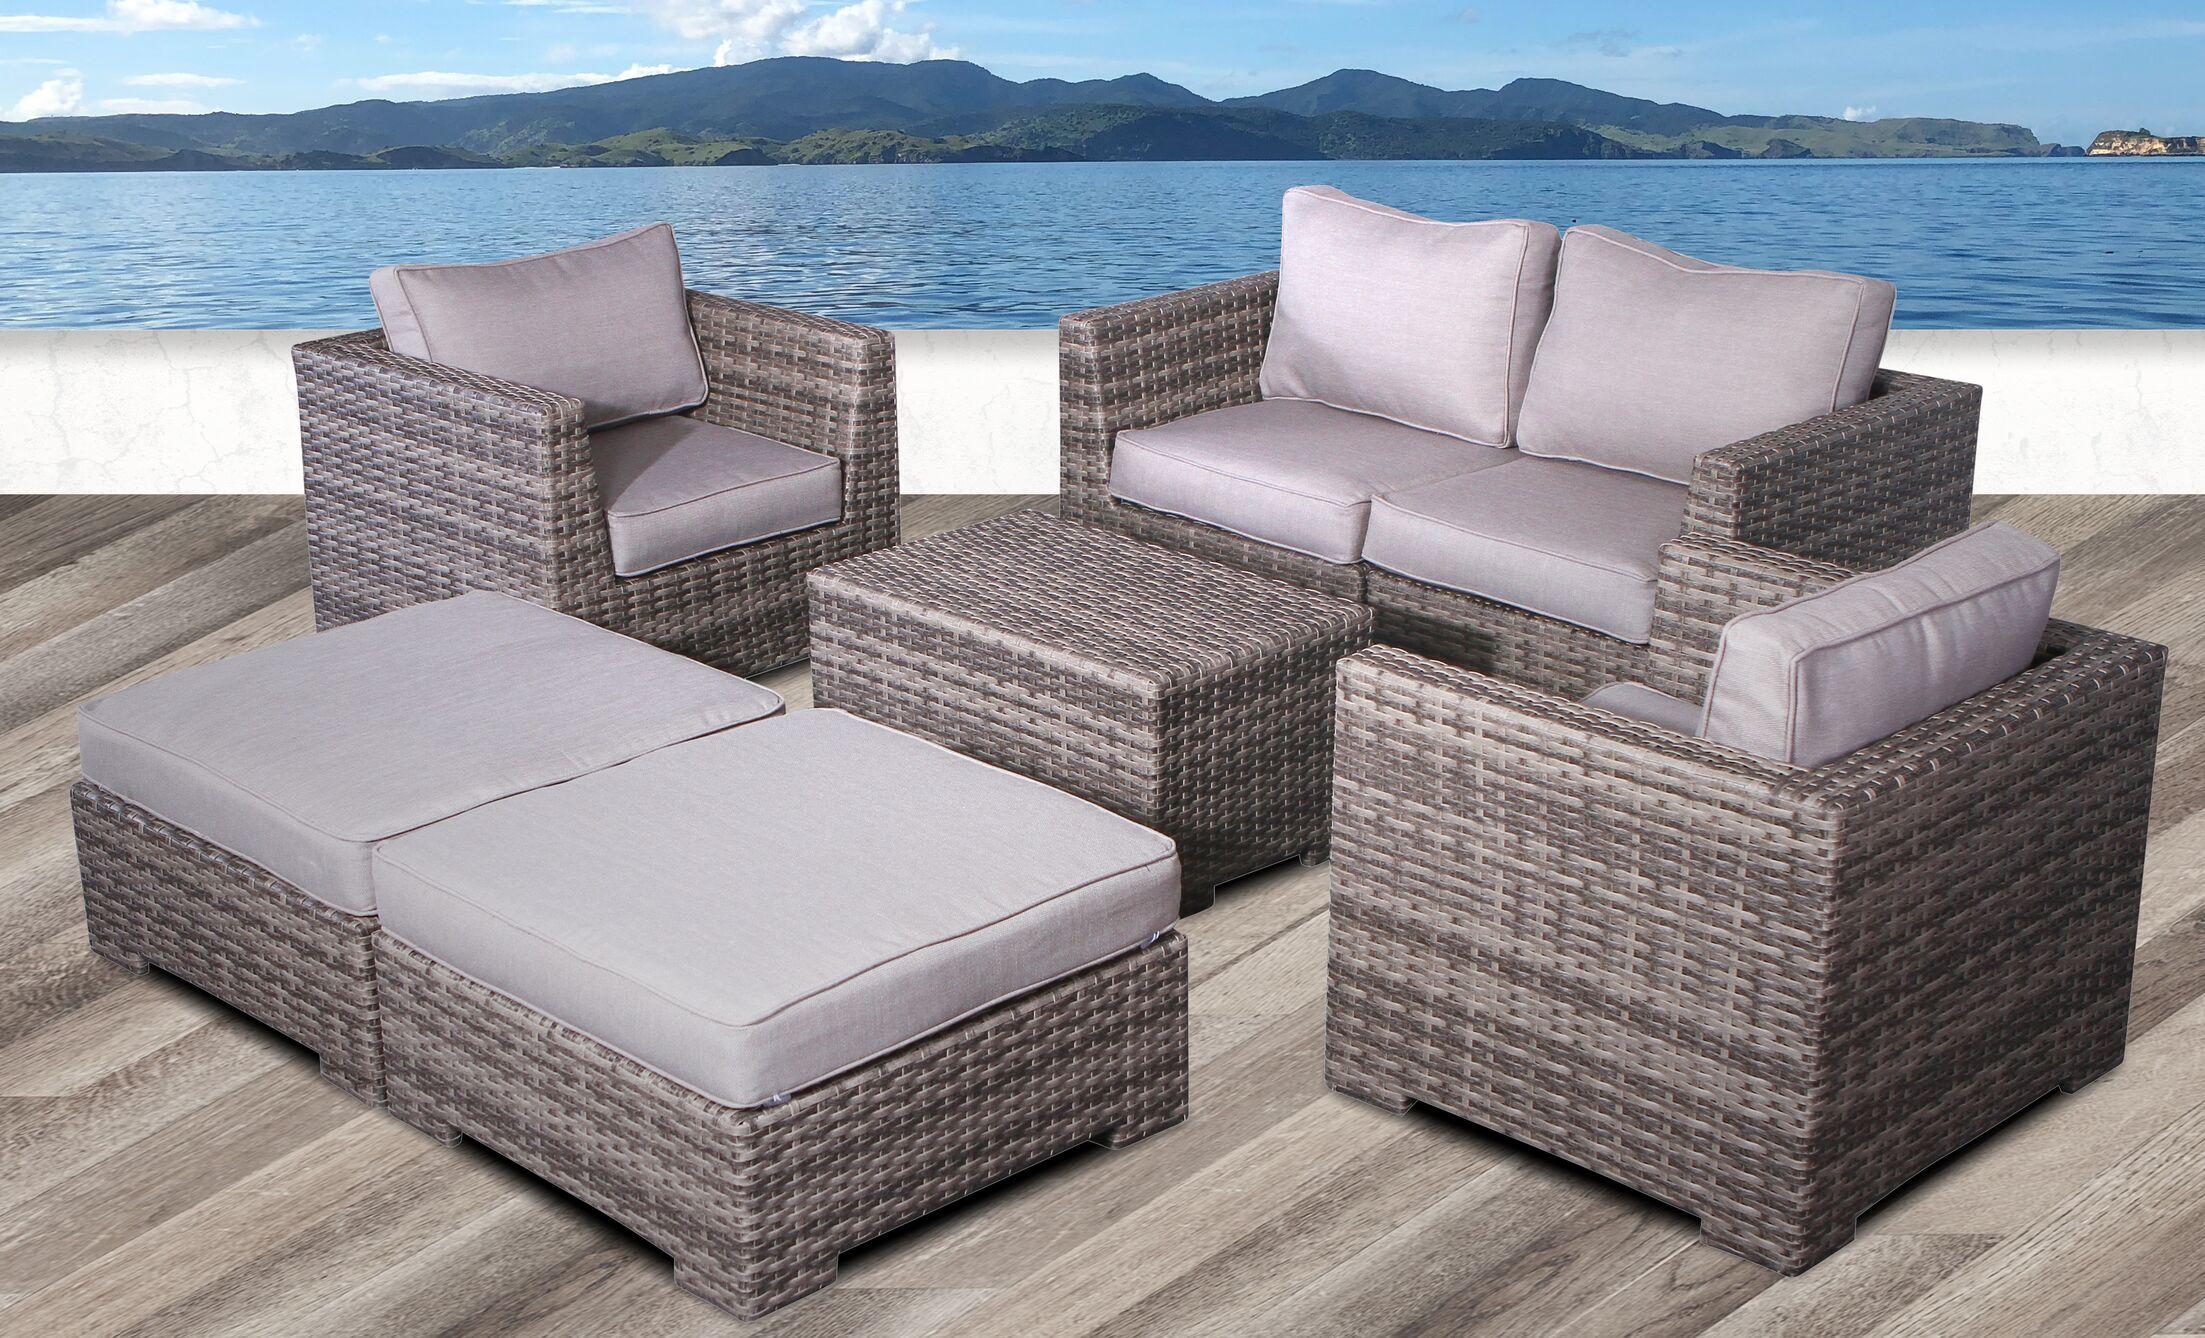 Pierson Modular 6 Piece Conversation Set with Cushions